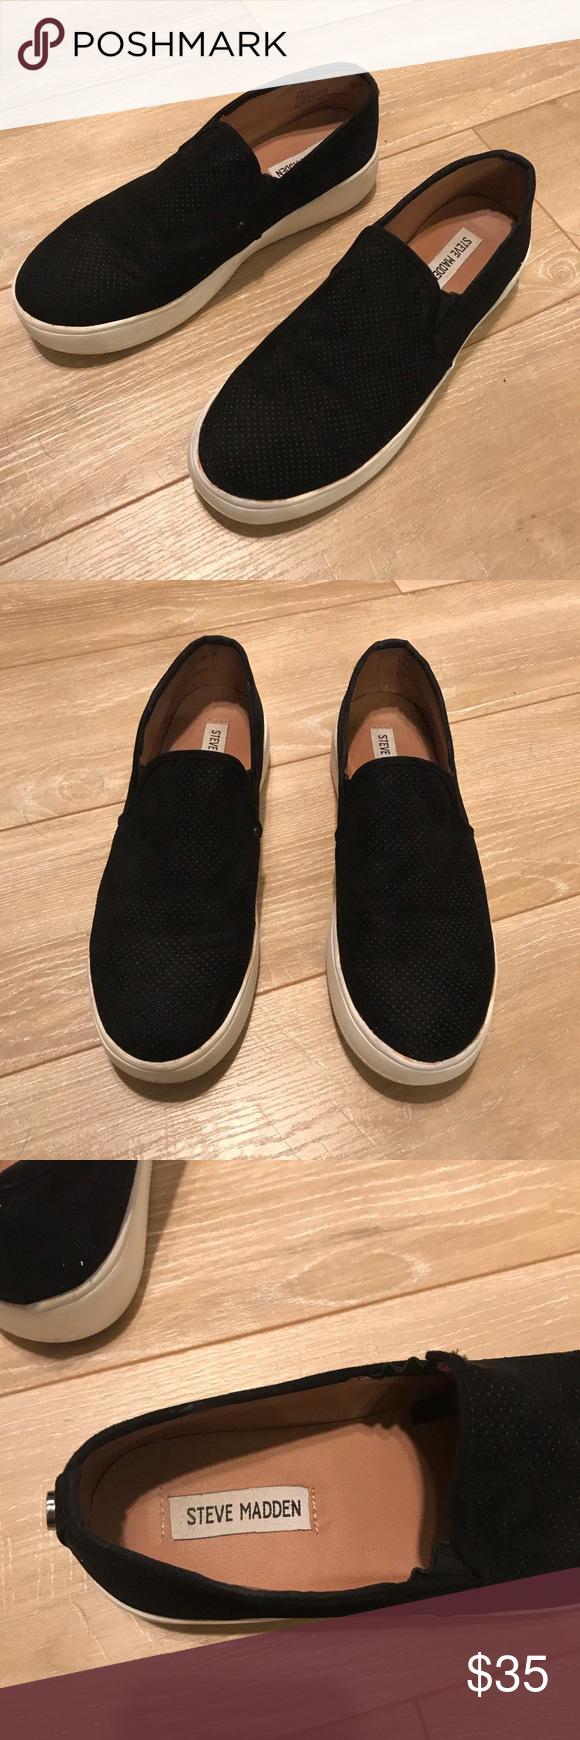 sneaker, Steve madden shoes sneakers